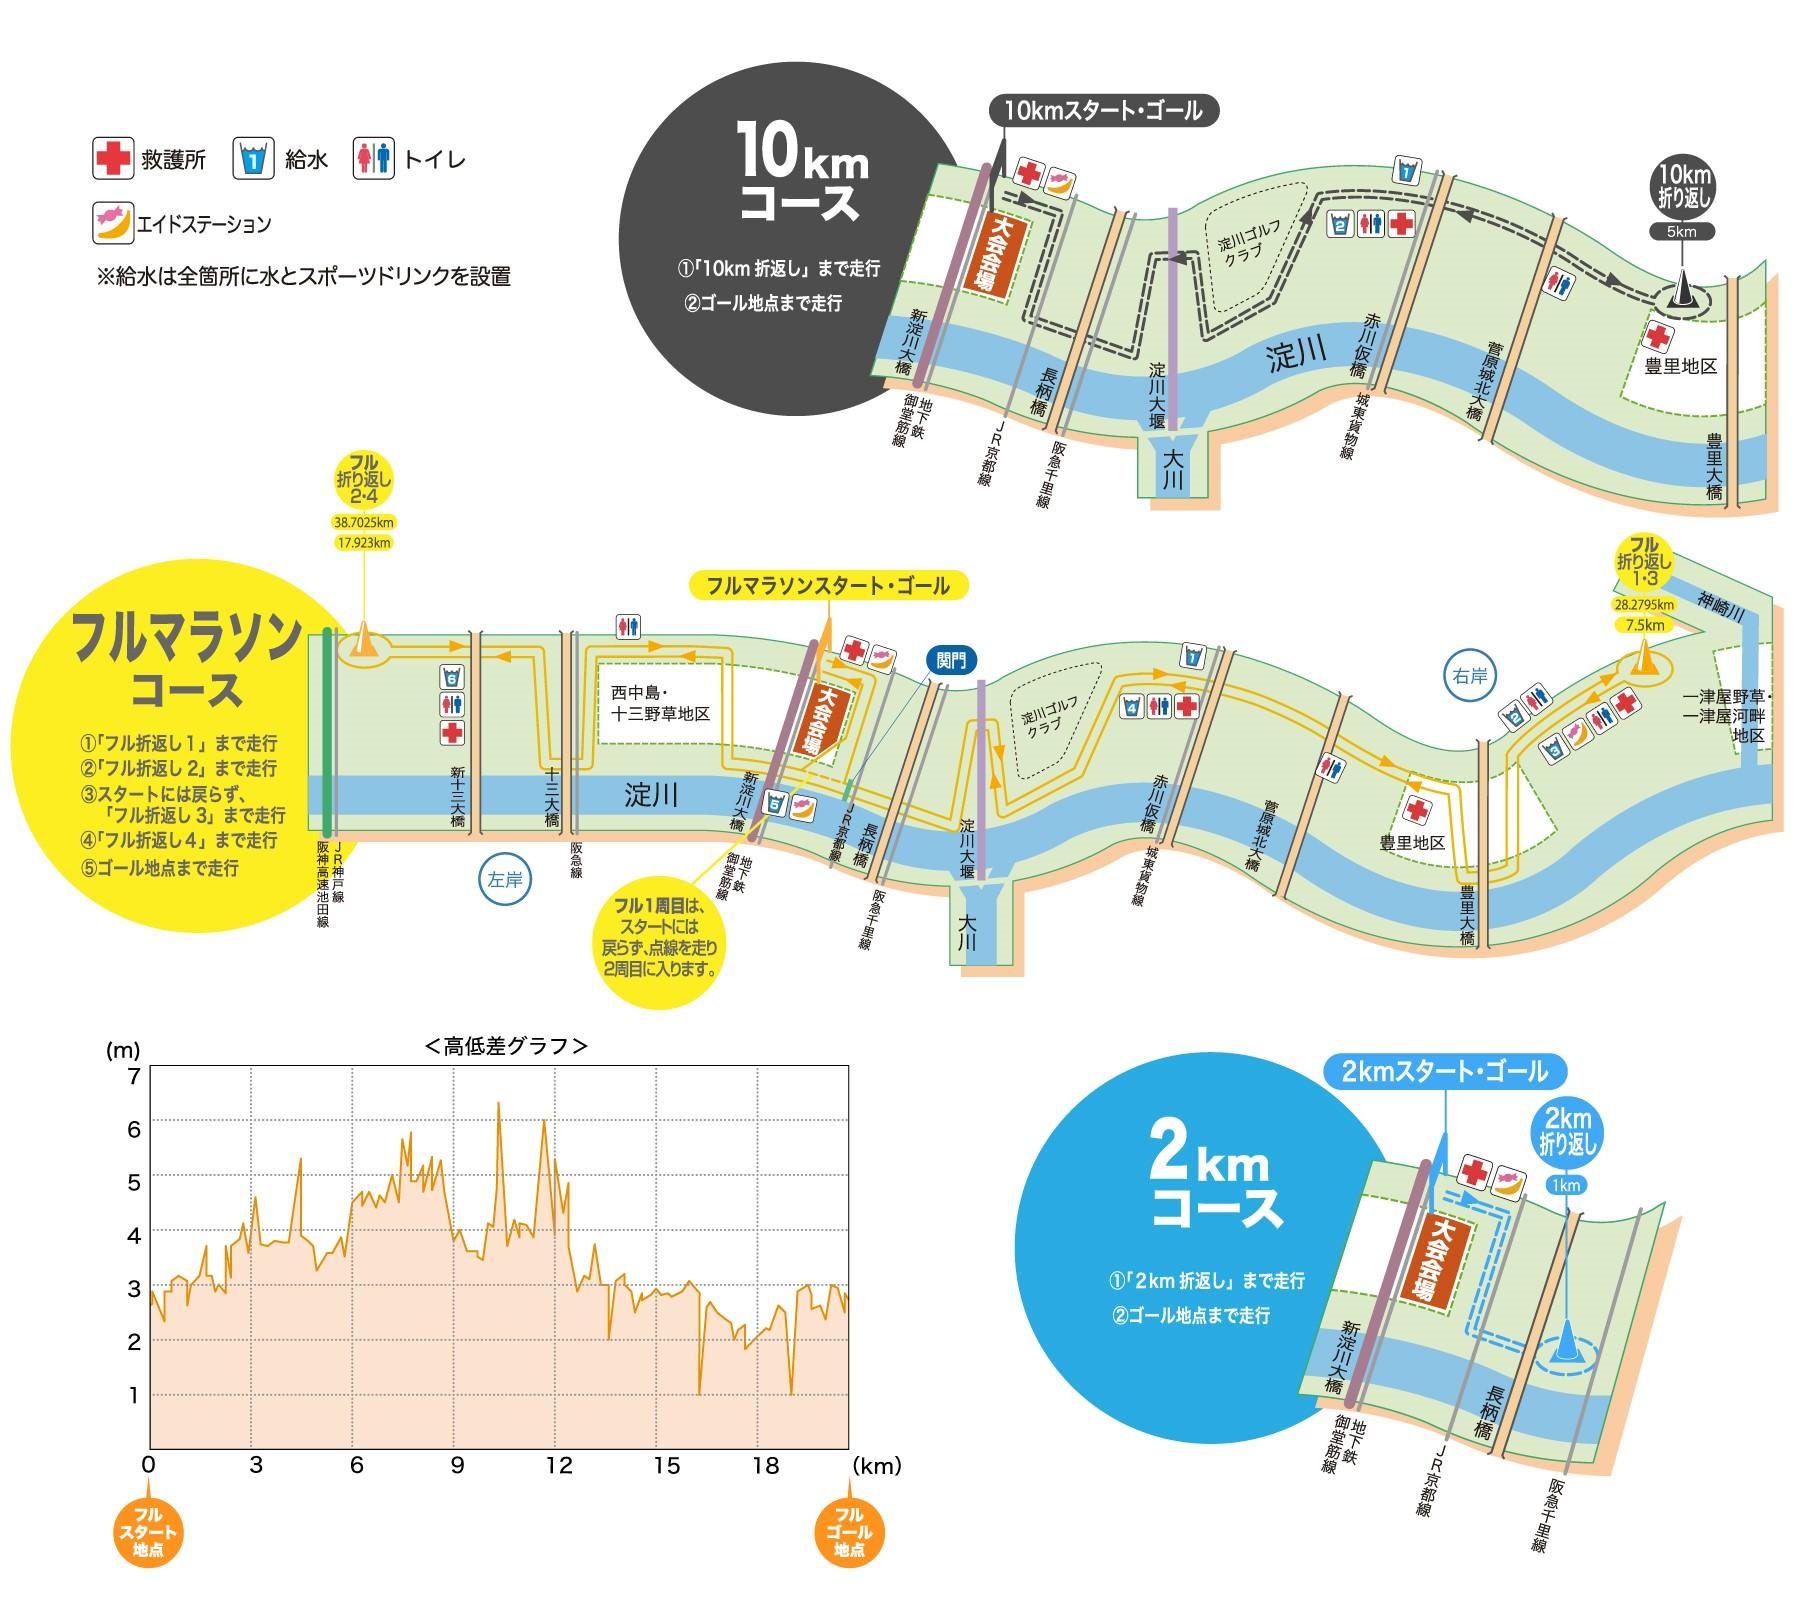 https://sportsone.jp/naniwa/2021/images/course_map_20210328.jpg